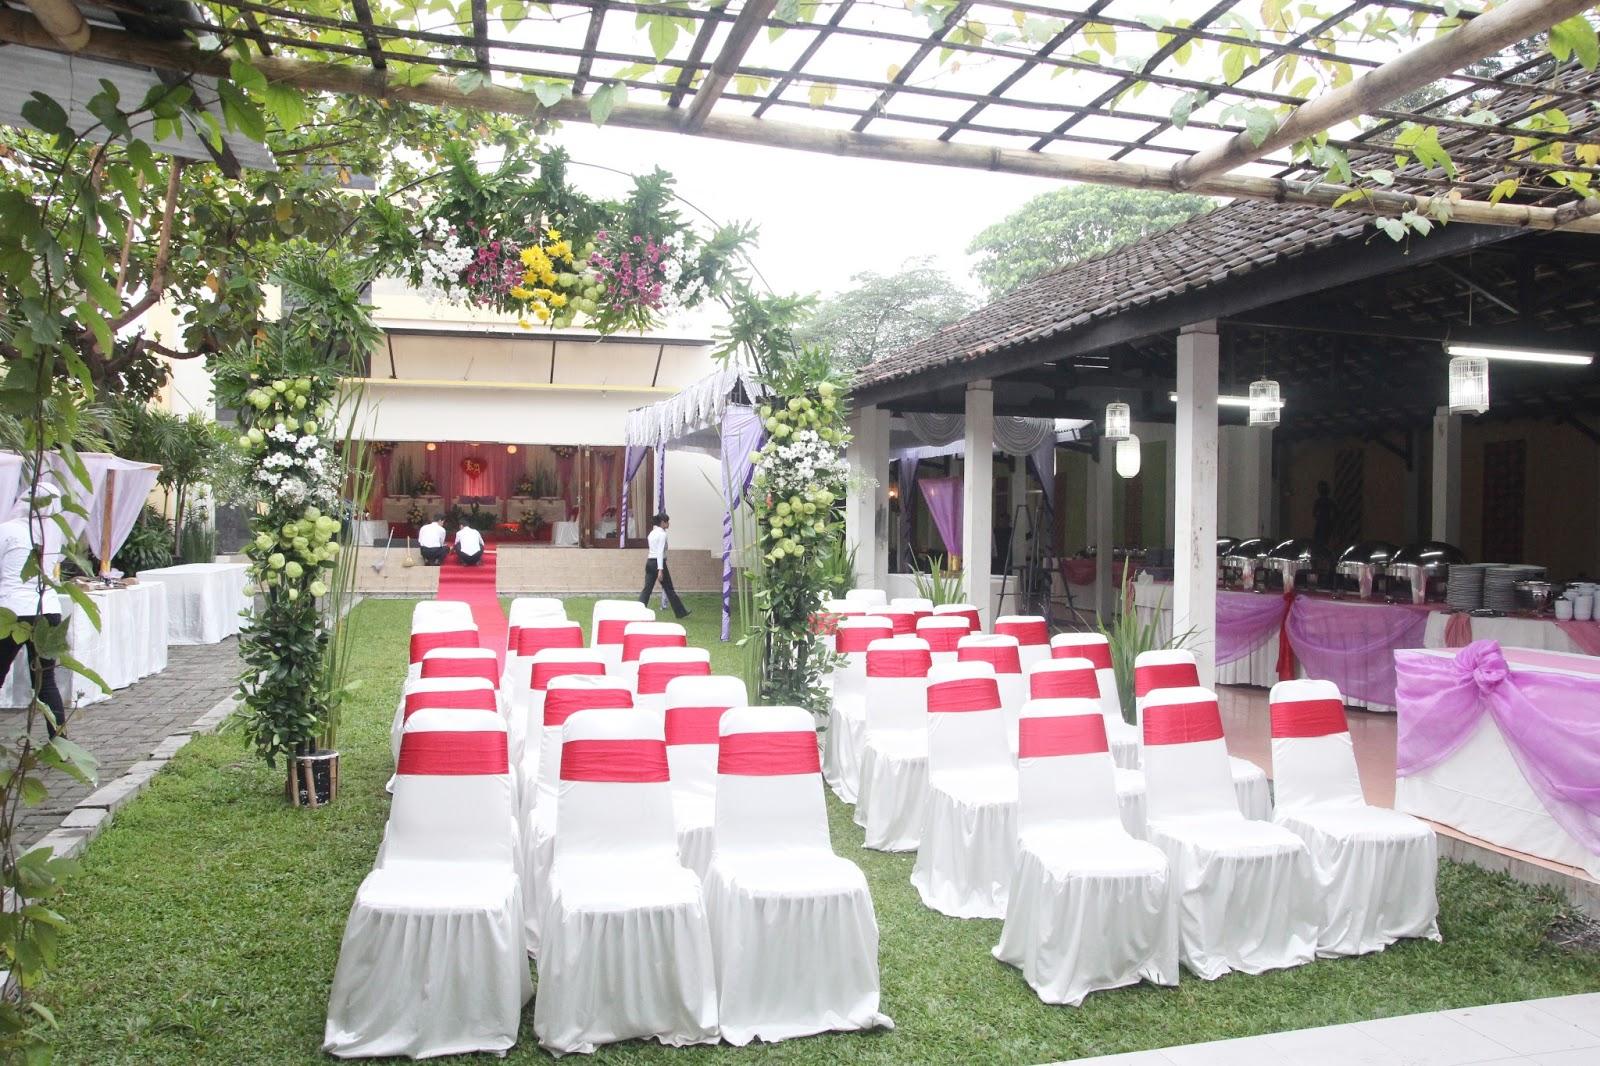 Foto Wedding Dg Dekorasi Pernikahan Outdoor Di Yogyakarta: Dekorasi Kaze & Addien Wedding Party